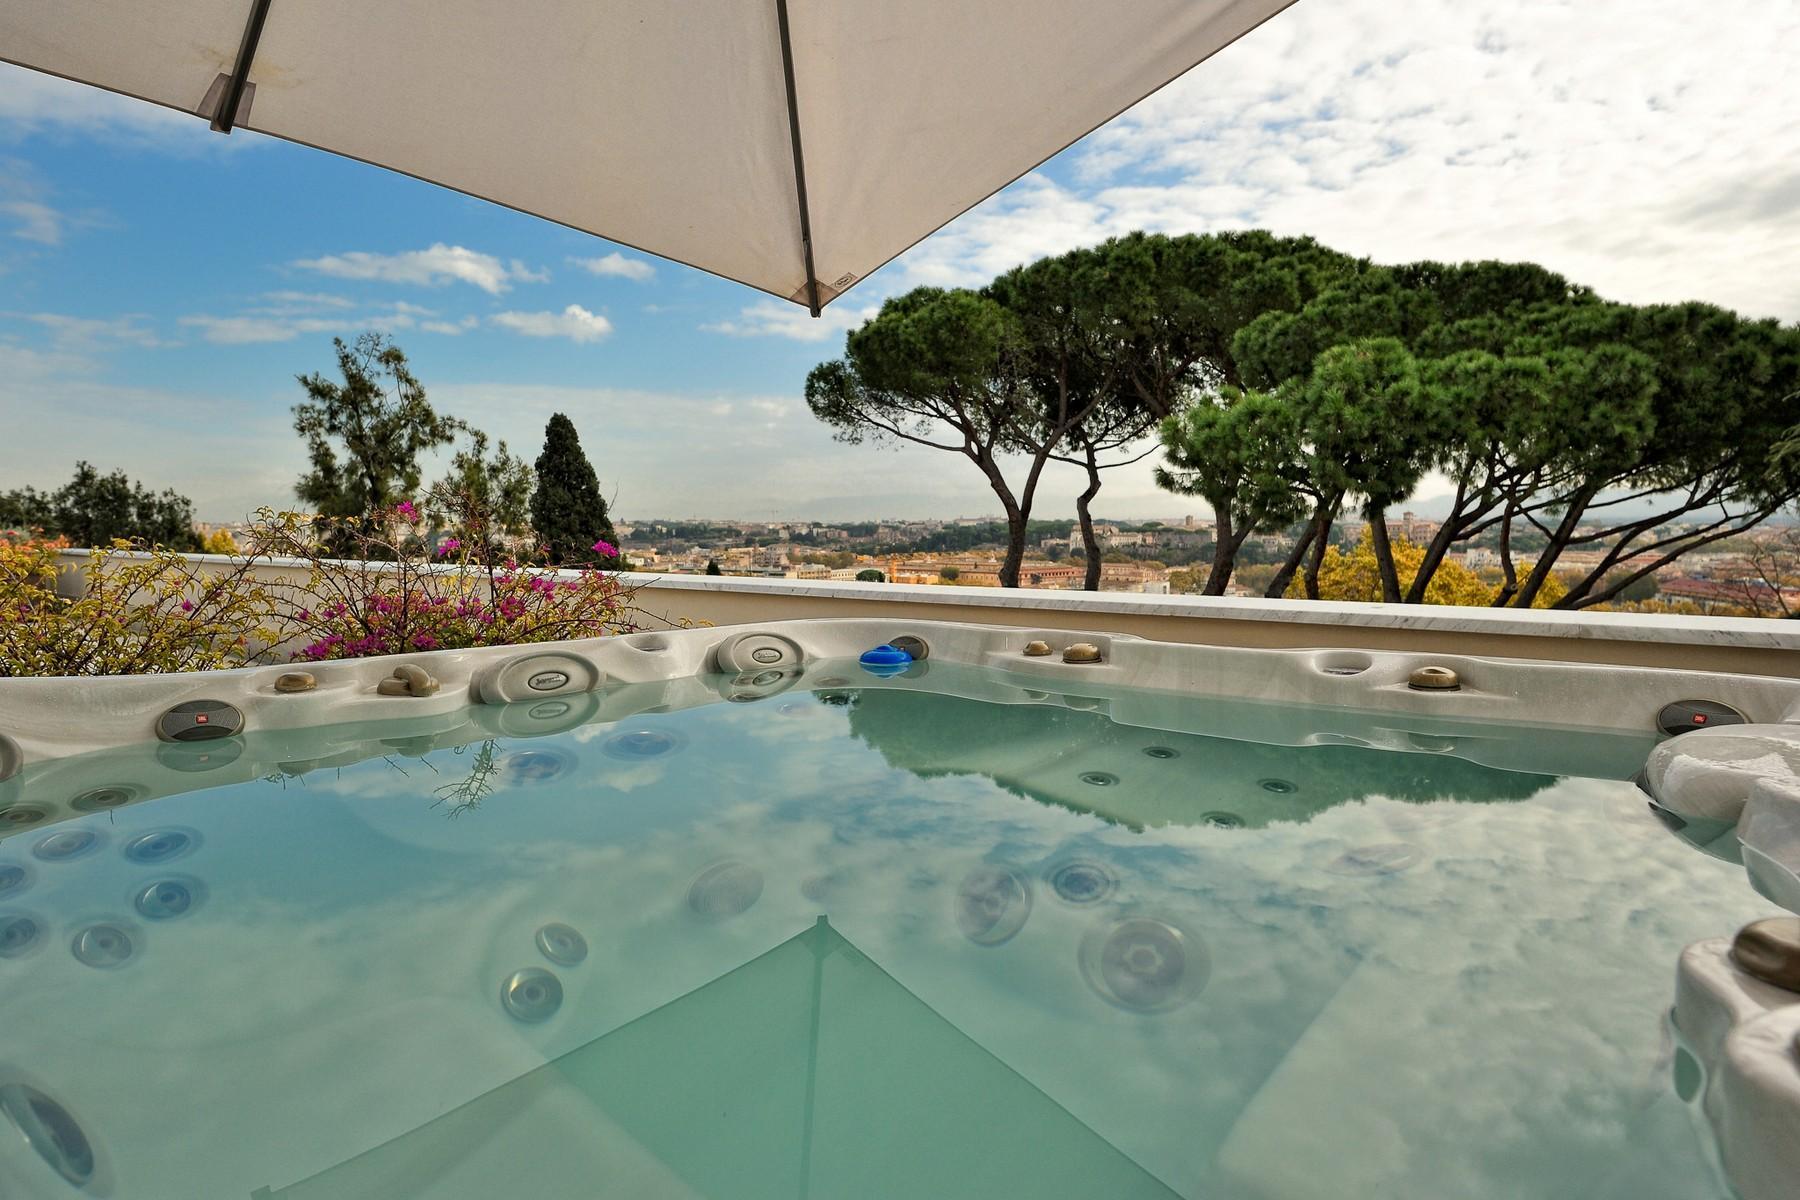 Villa Calandrelli, Charme und Stil im grünen Herzen Roms - 5